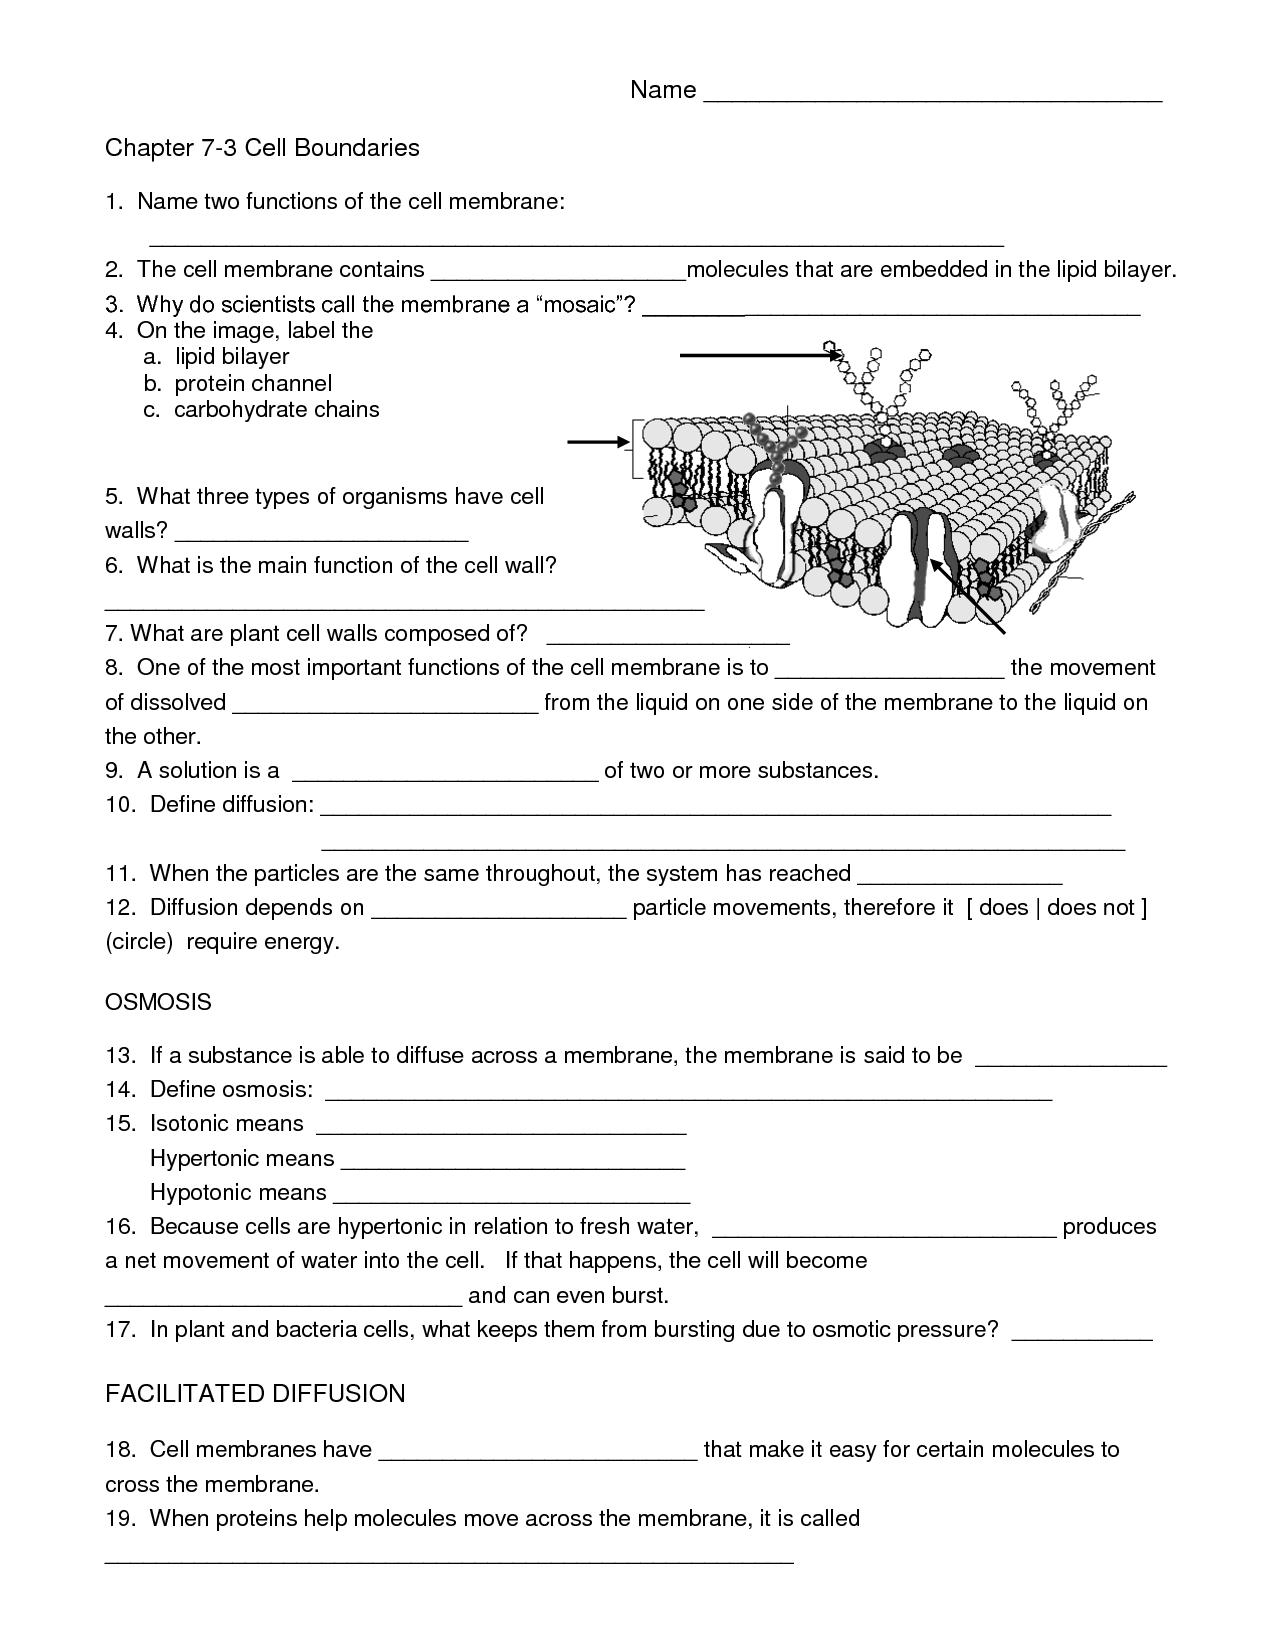 Biology Cell Worksheets | Carpe Diem Science | Science Worksheets - Free Printable Biology Worksheets For High School